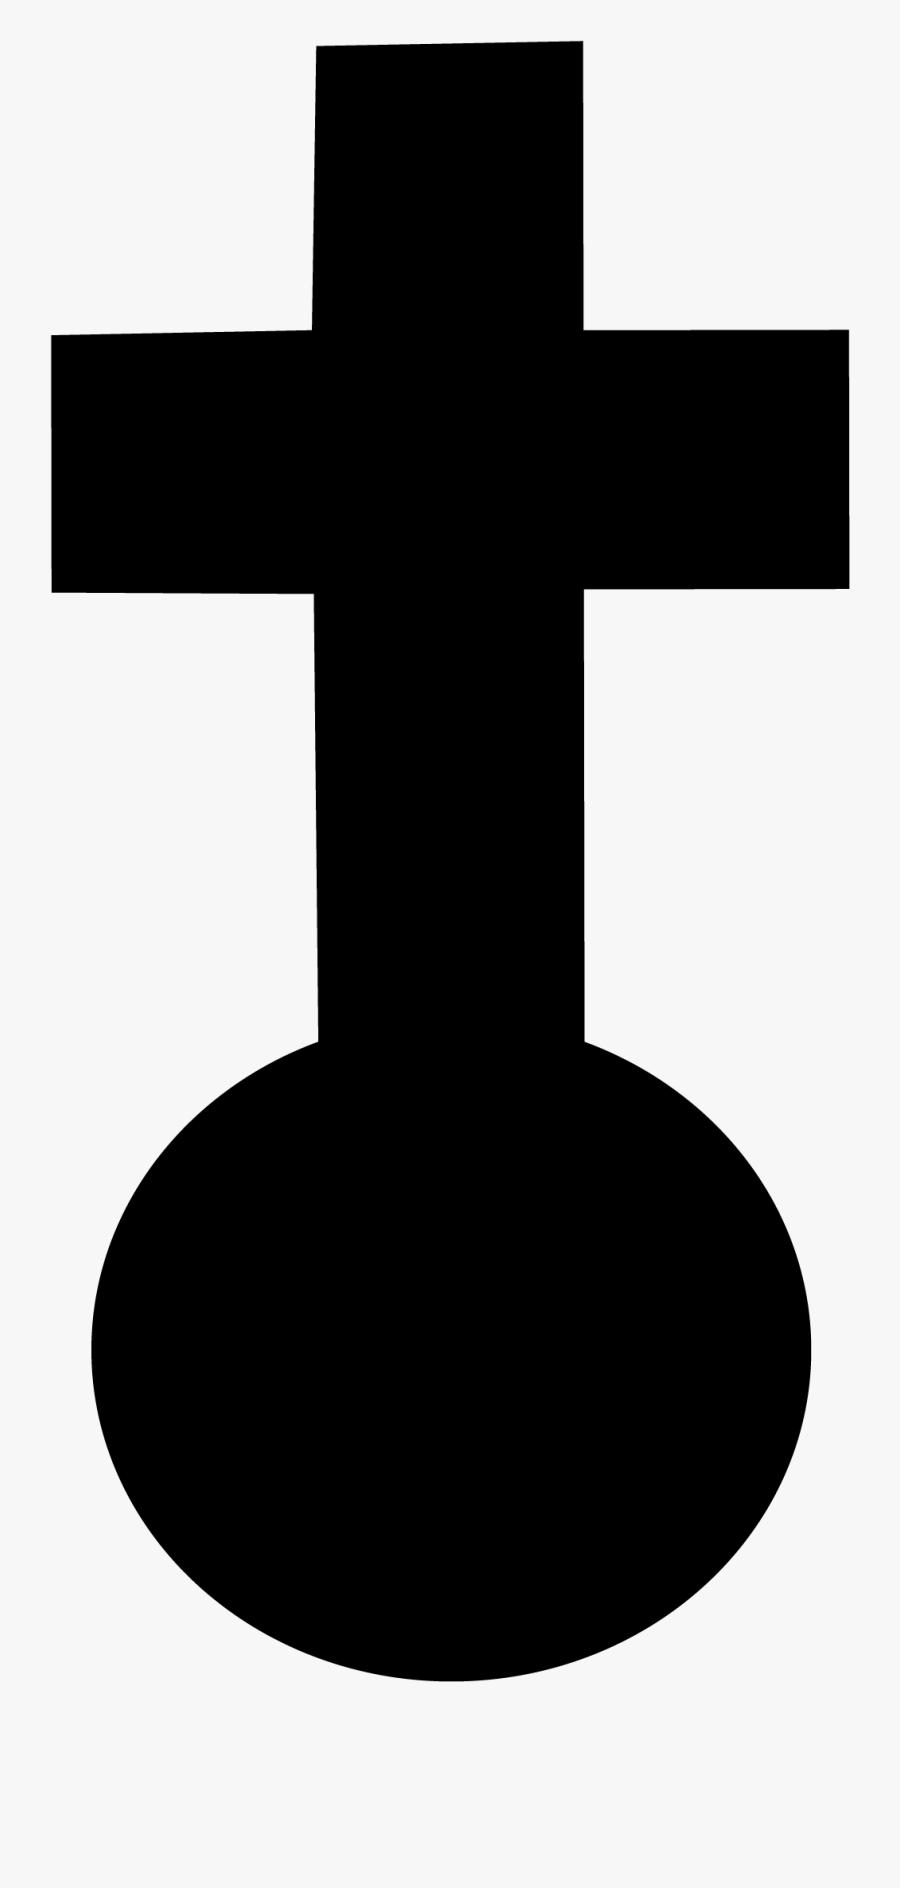 Church Symbol Png - Map Symbol For Church, Transparent Clipart